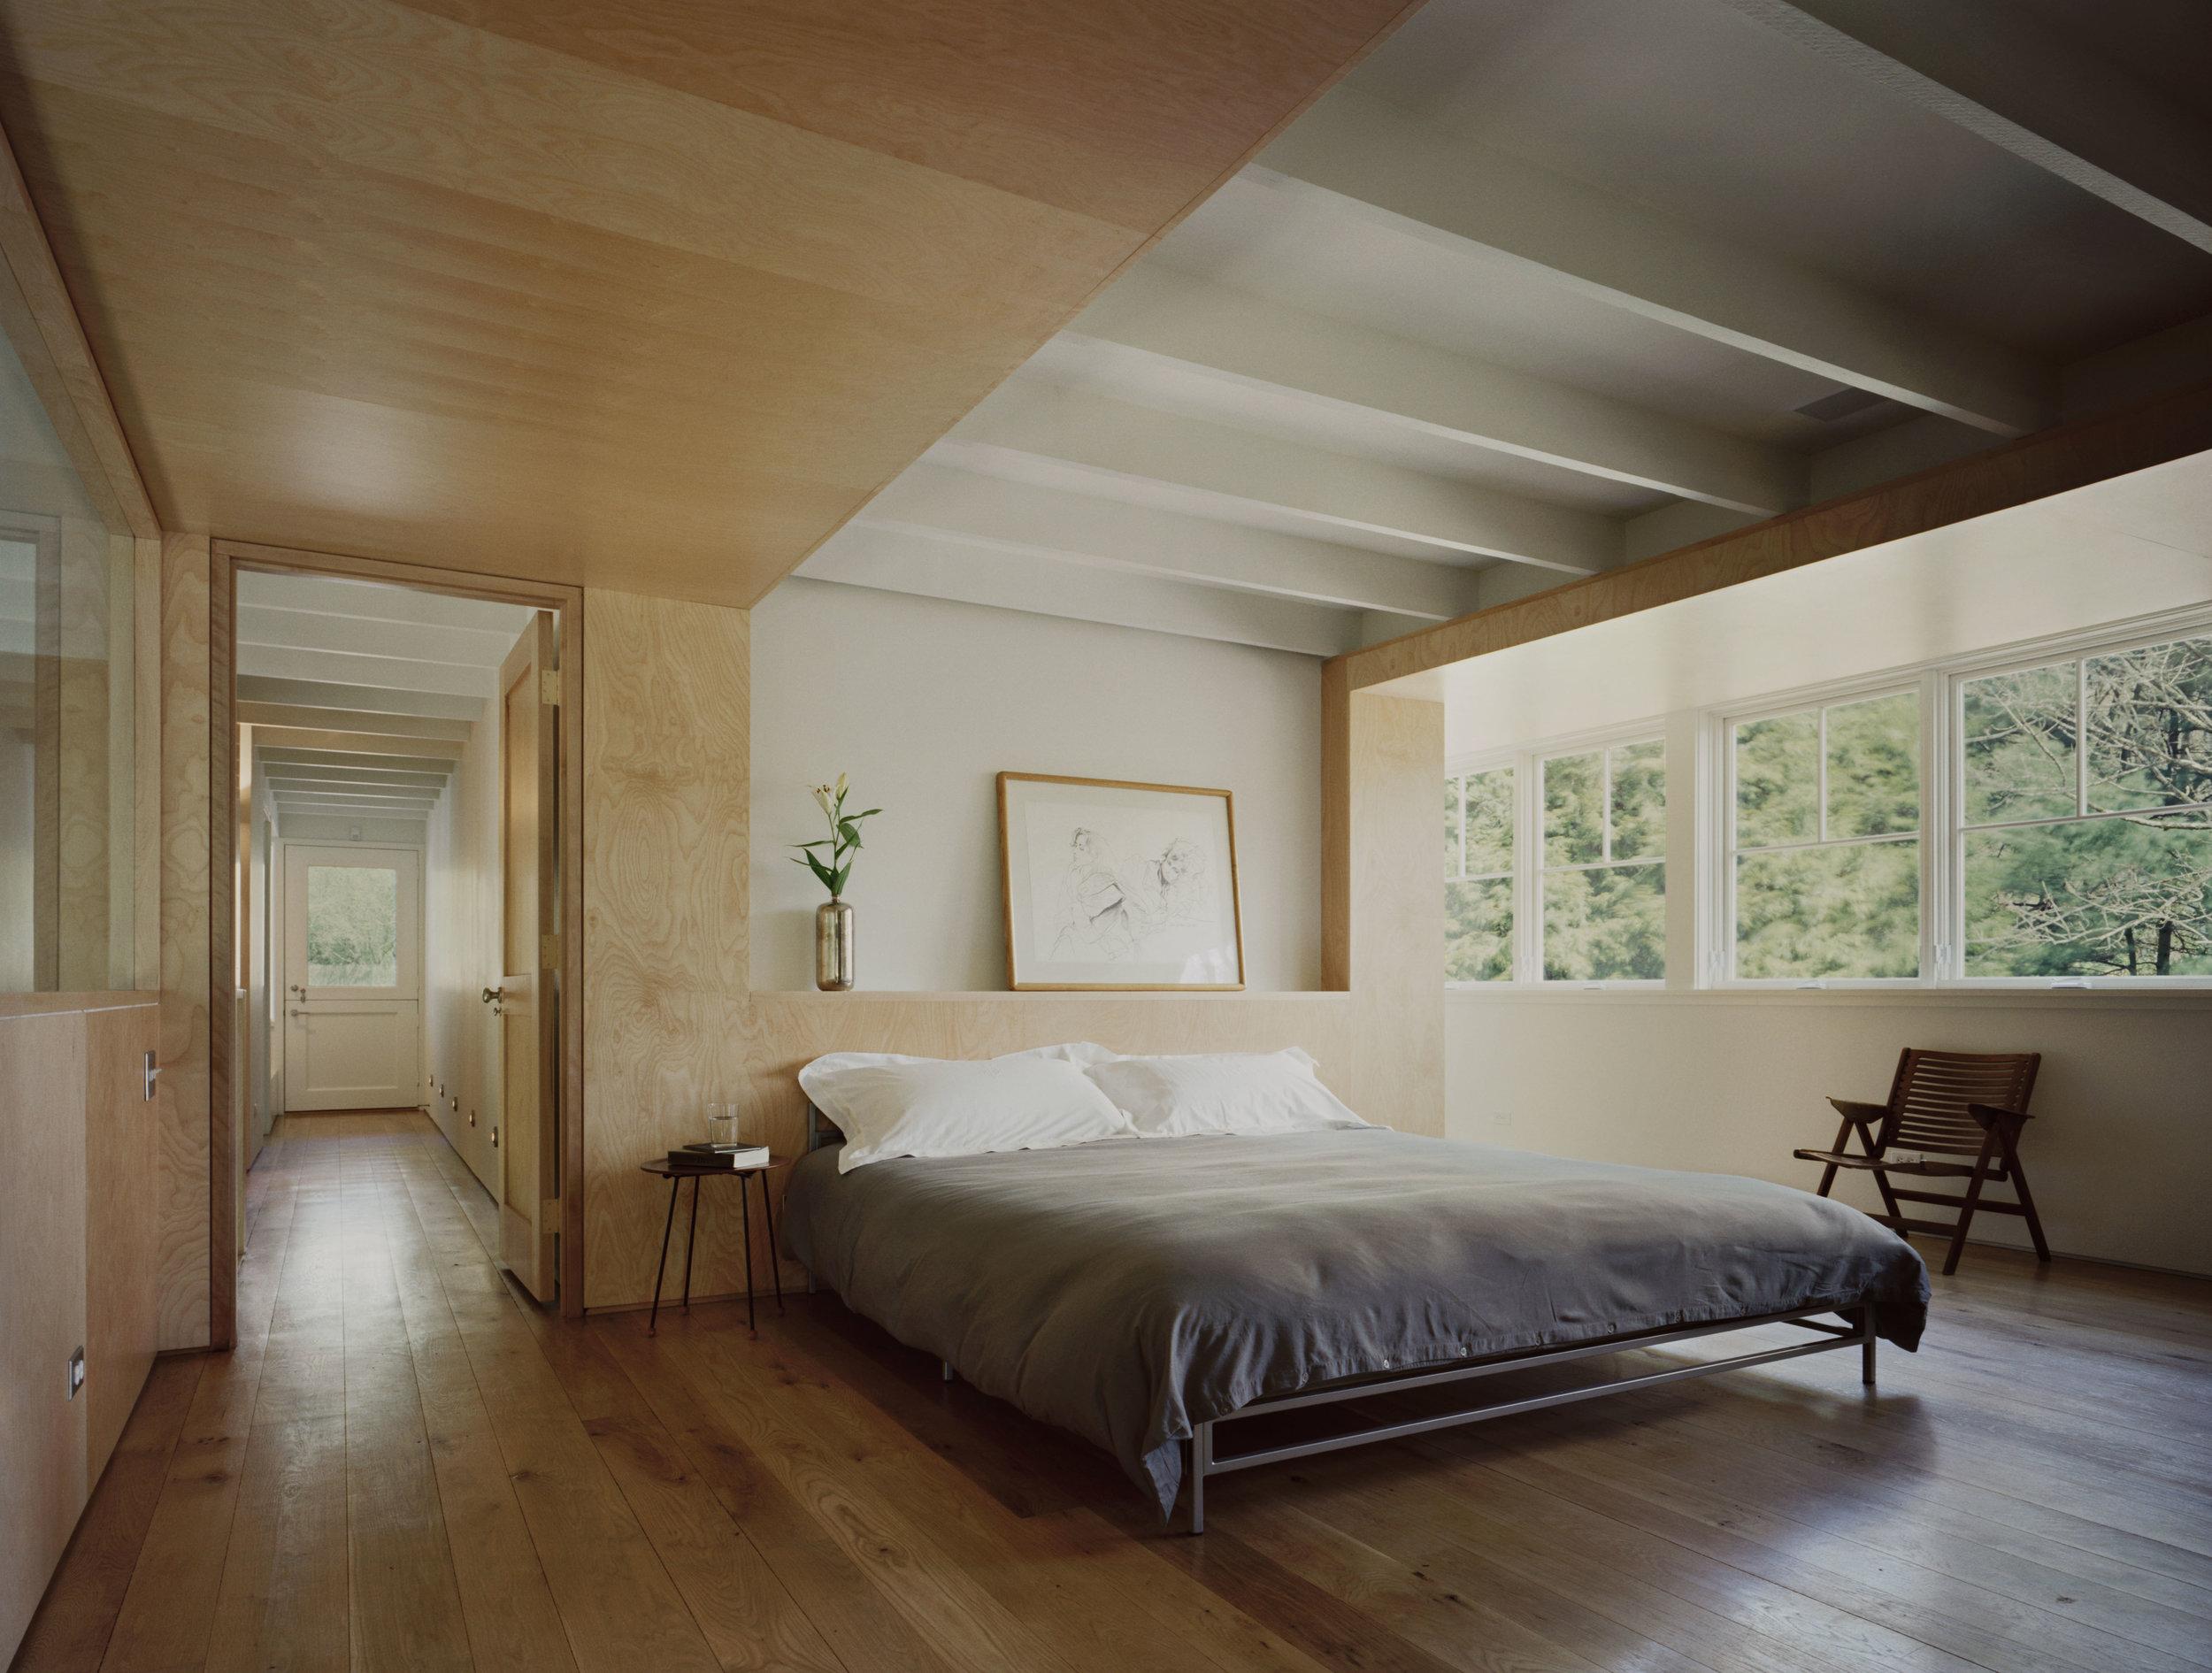 relaxing custom luxury bedroom large open windows space